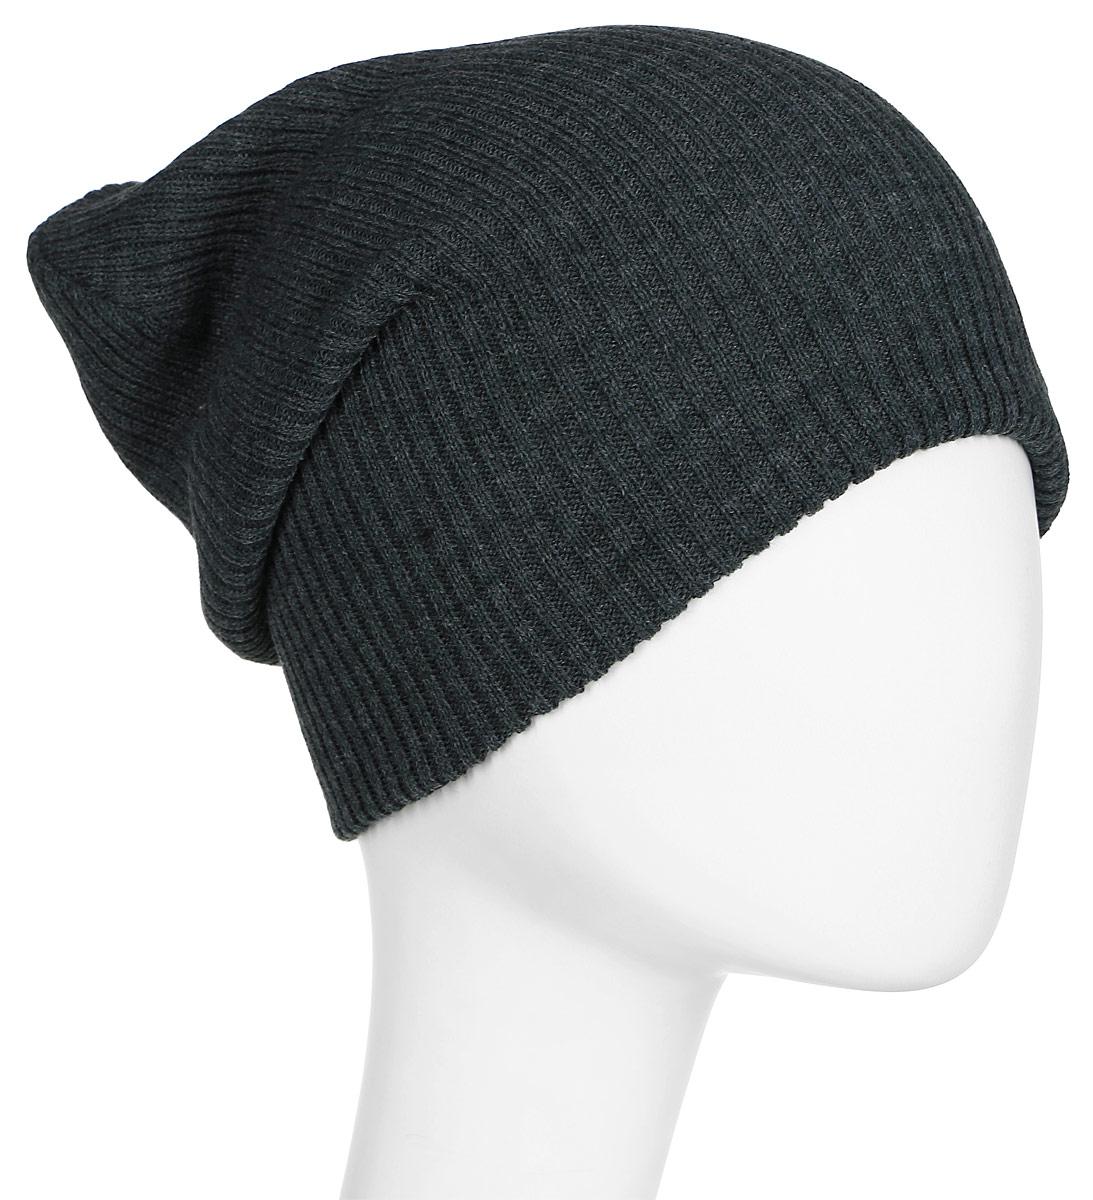 Шапка Asics Training Essential Beanie, цвет: серый, серо-зеленый. 146817-4004. Размер 56/58146817-4004Демисезонная шапка